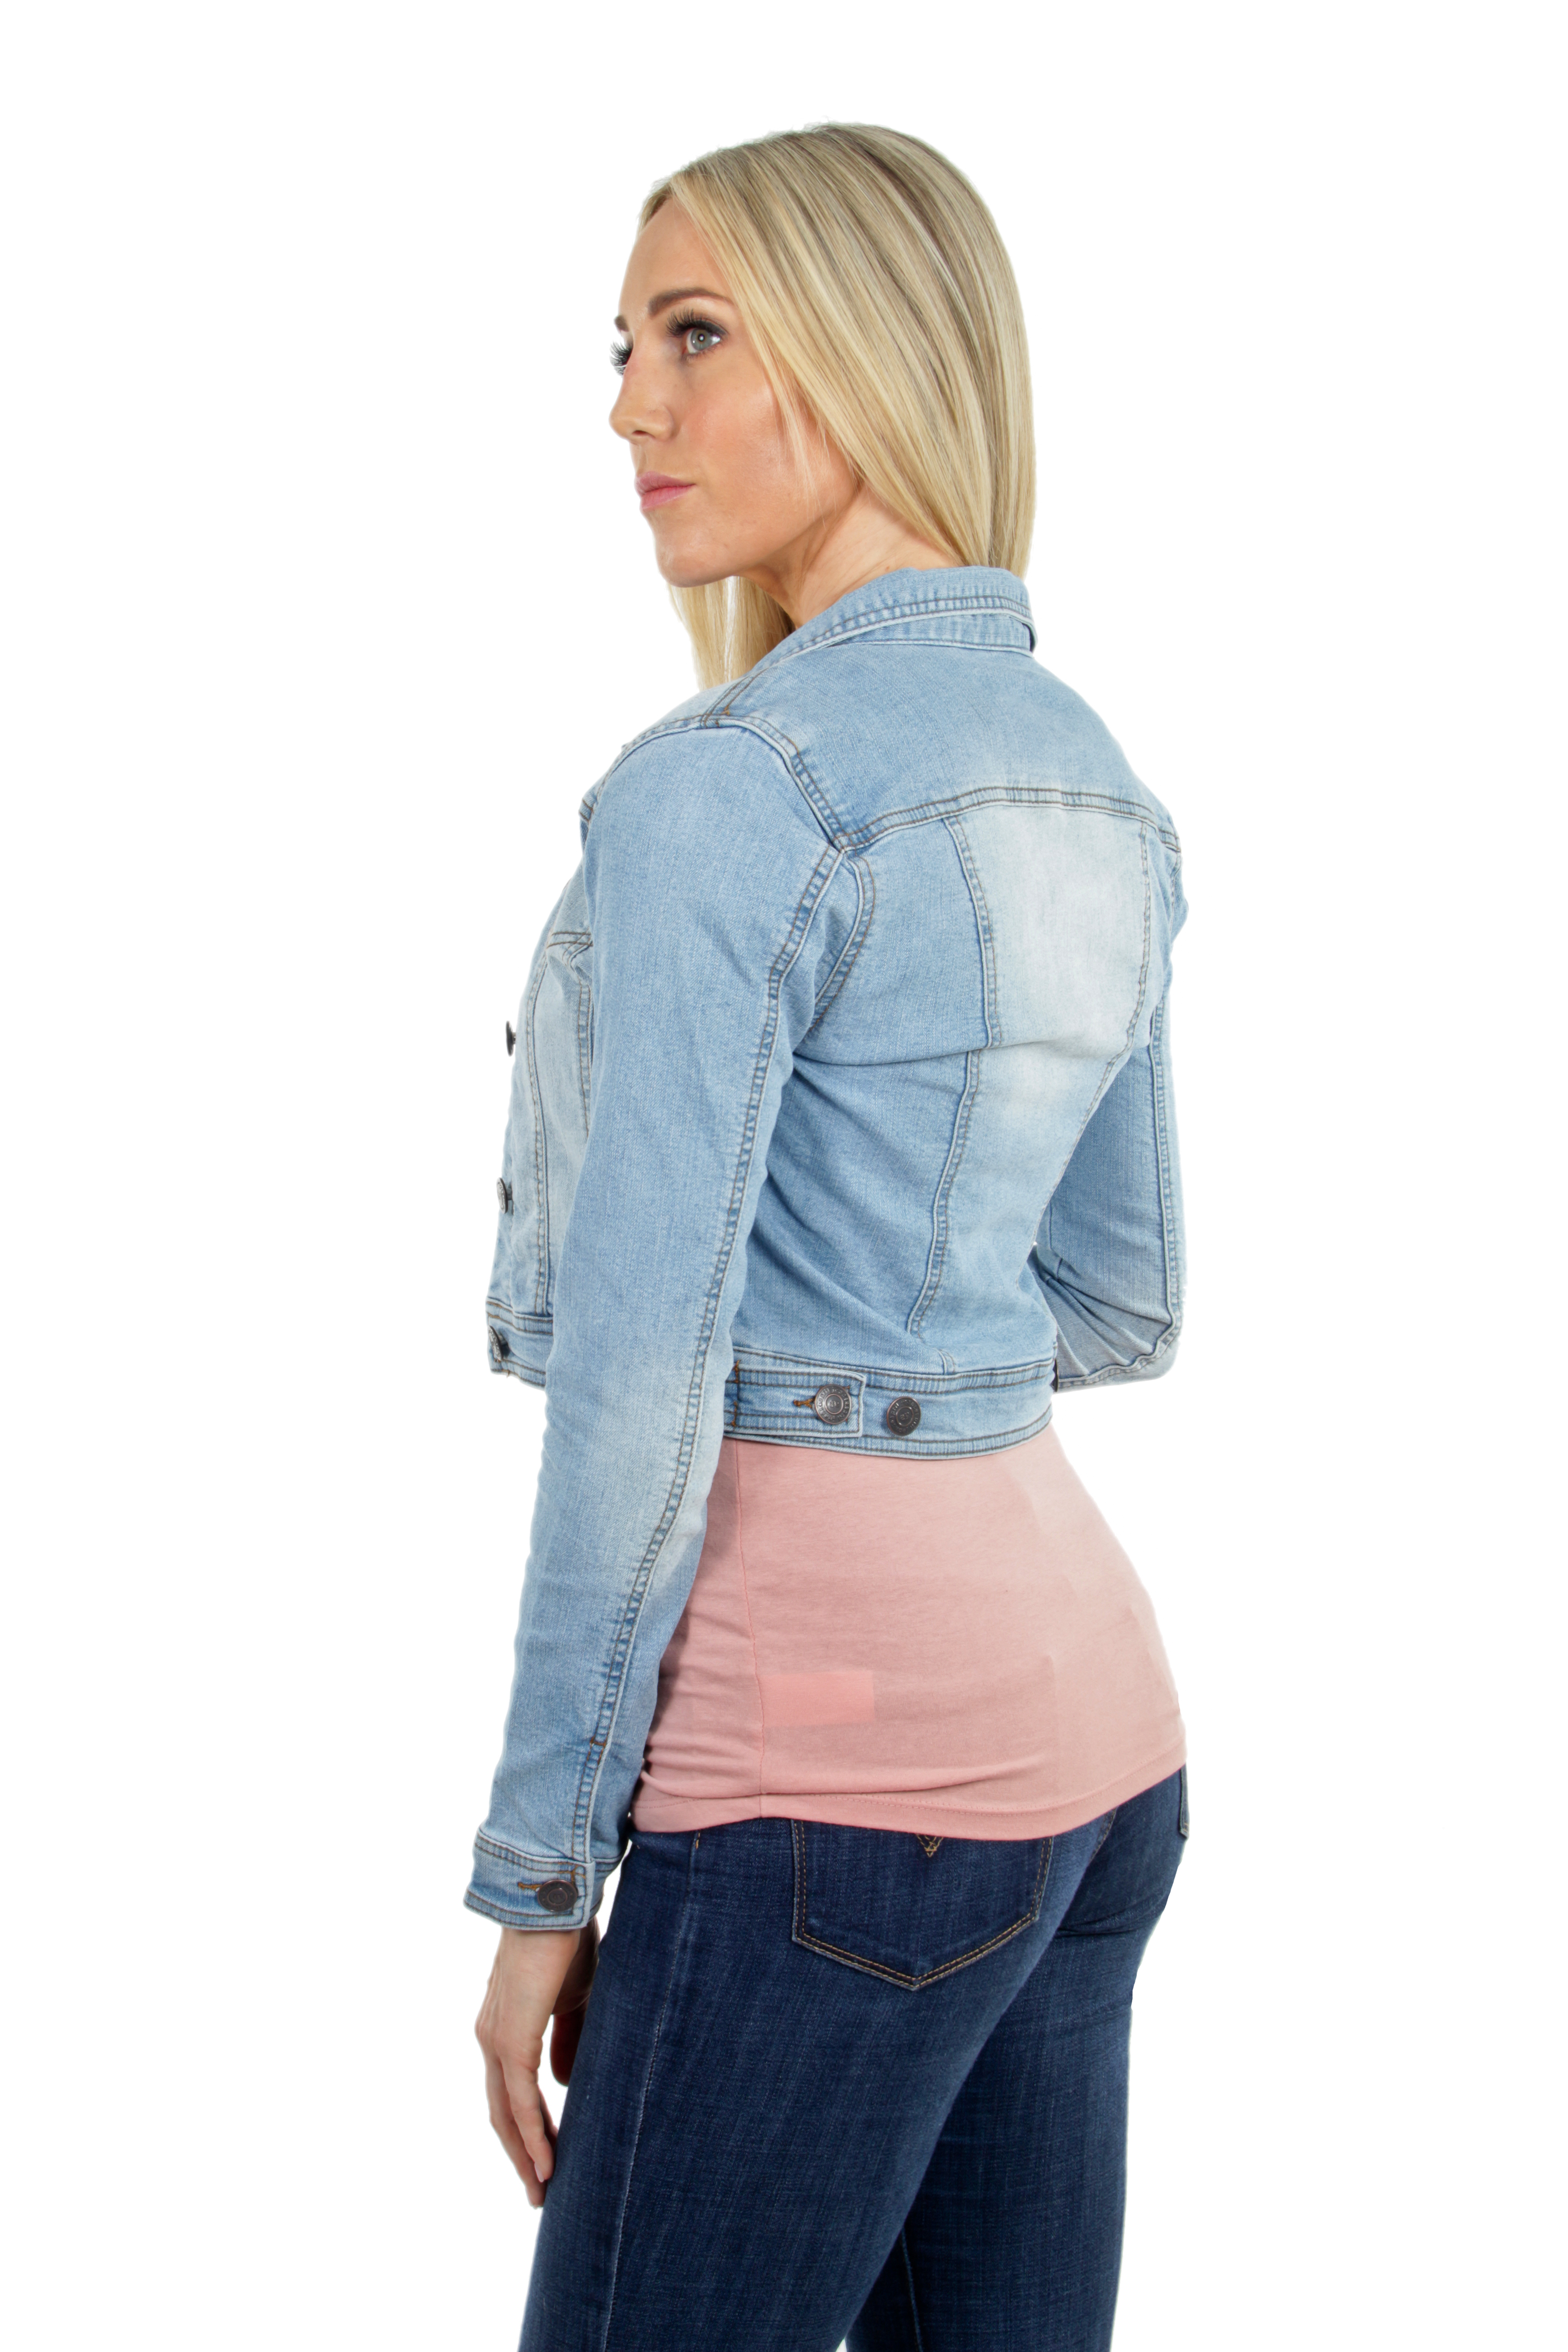 Women-039-s-Juniors-Premium-Stretch-Denim-Long-Sleeve-Jacket thumbnail 6